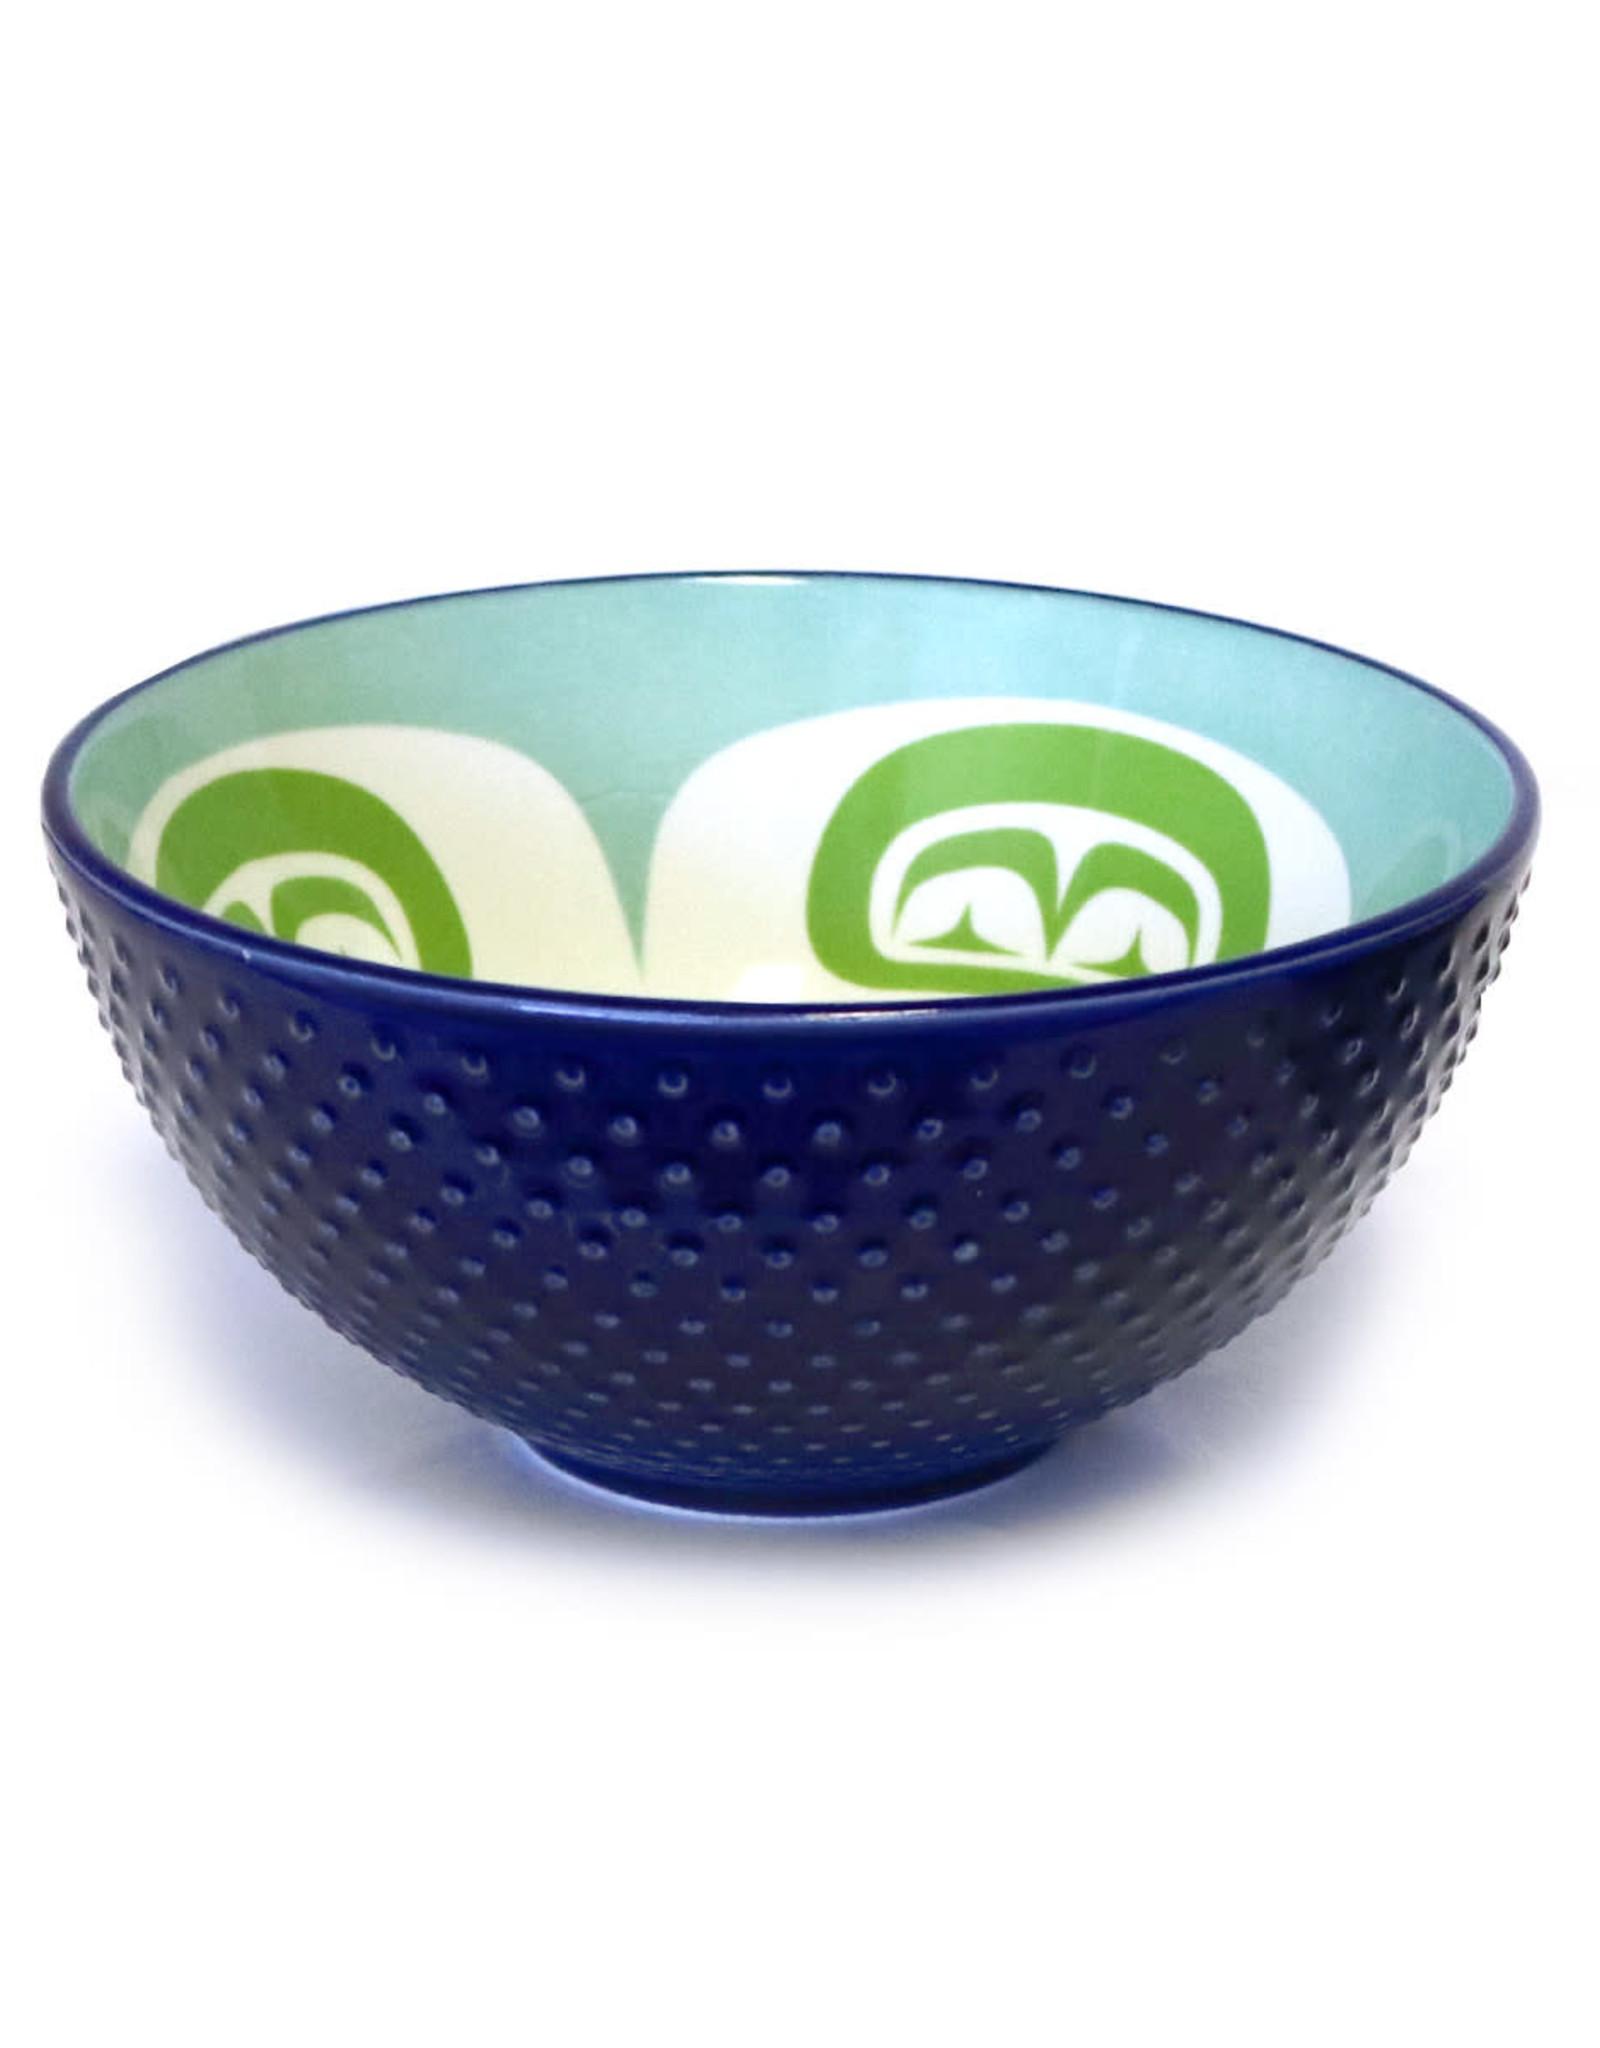 Porcelain Art Bowl - Medium